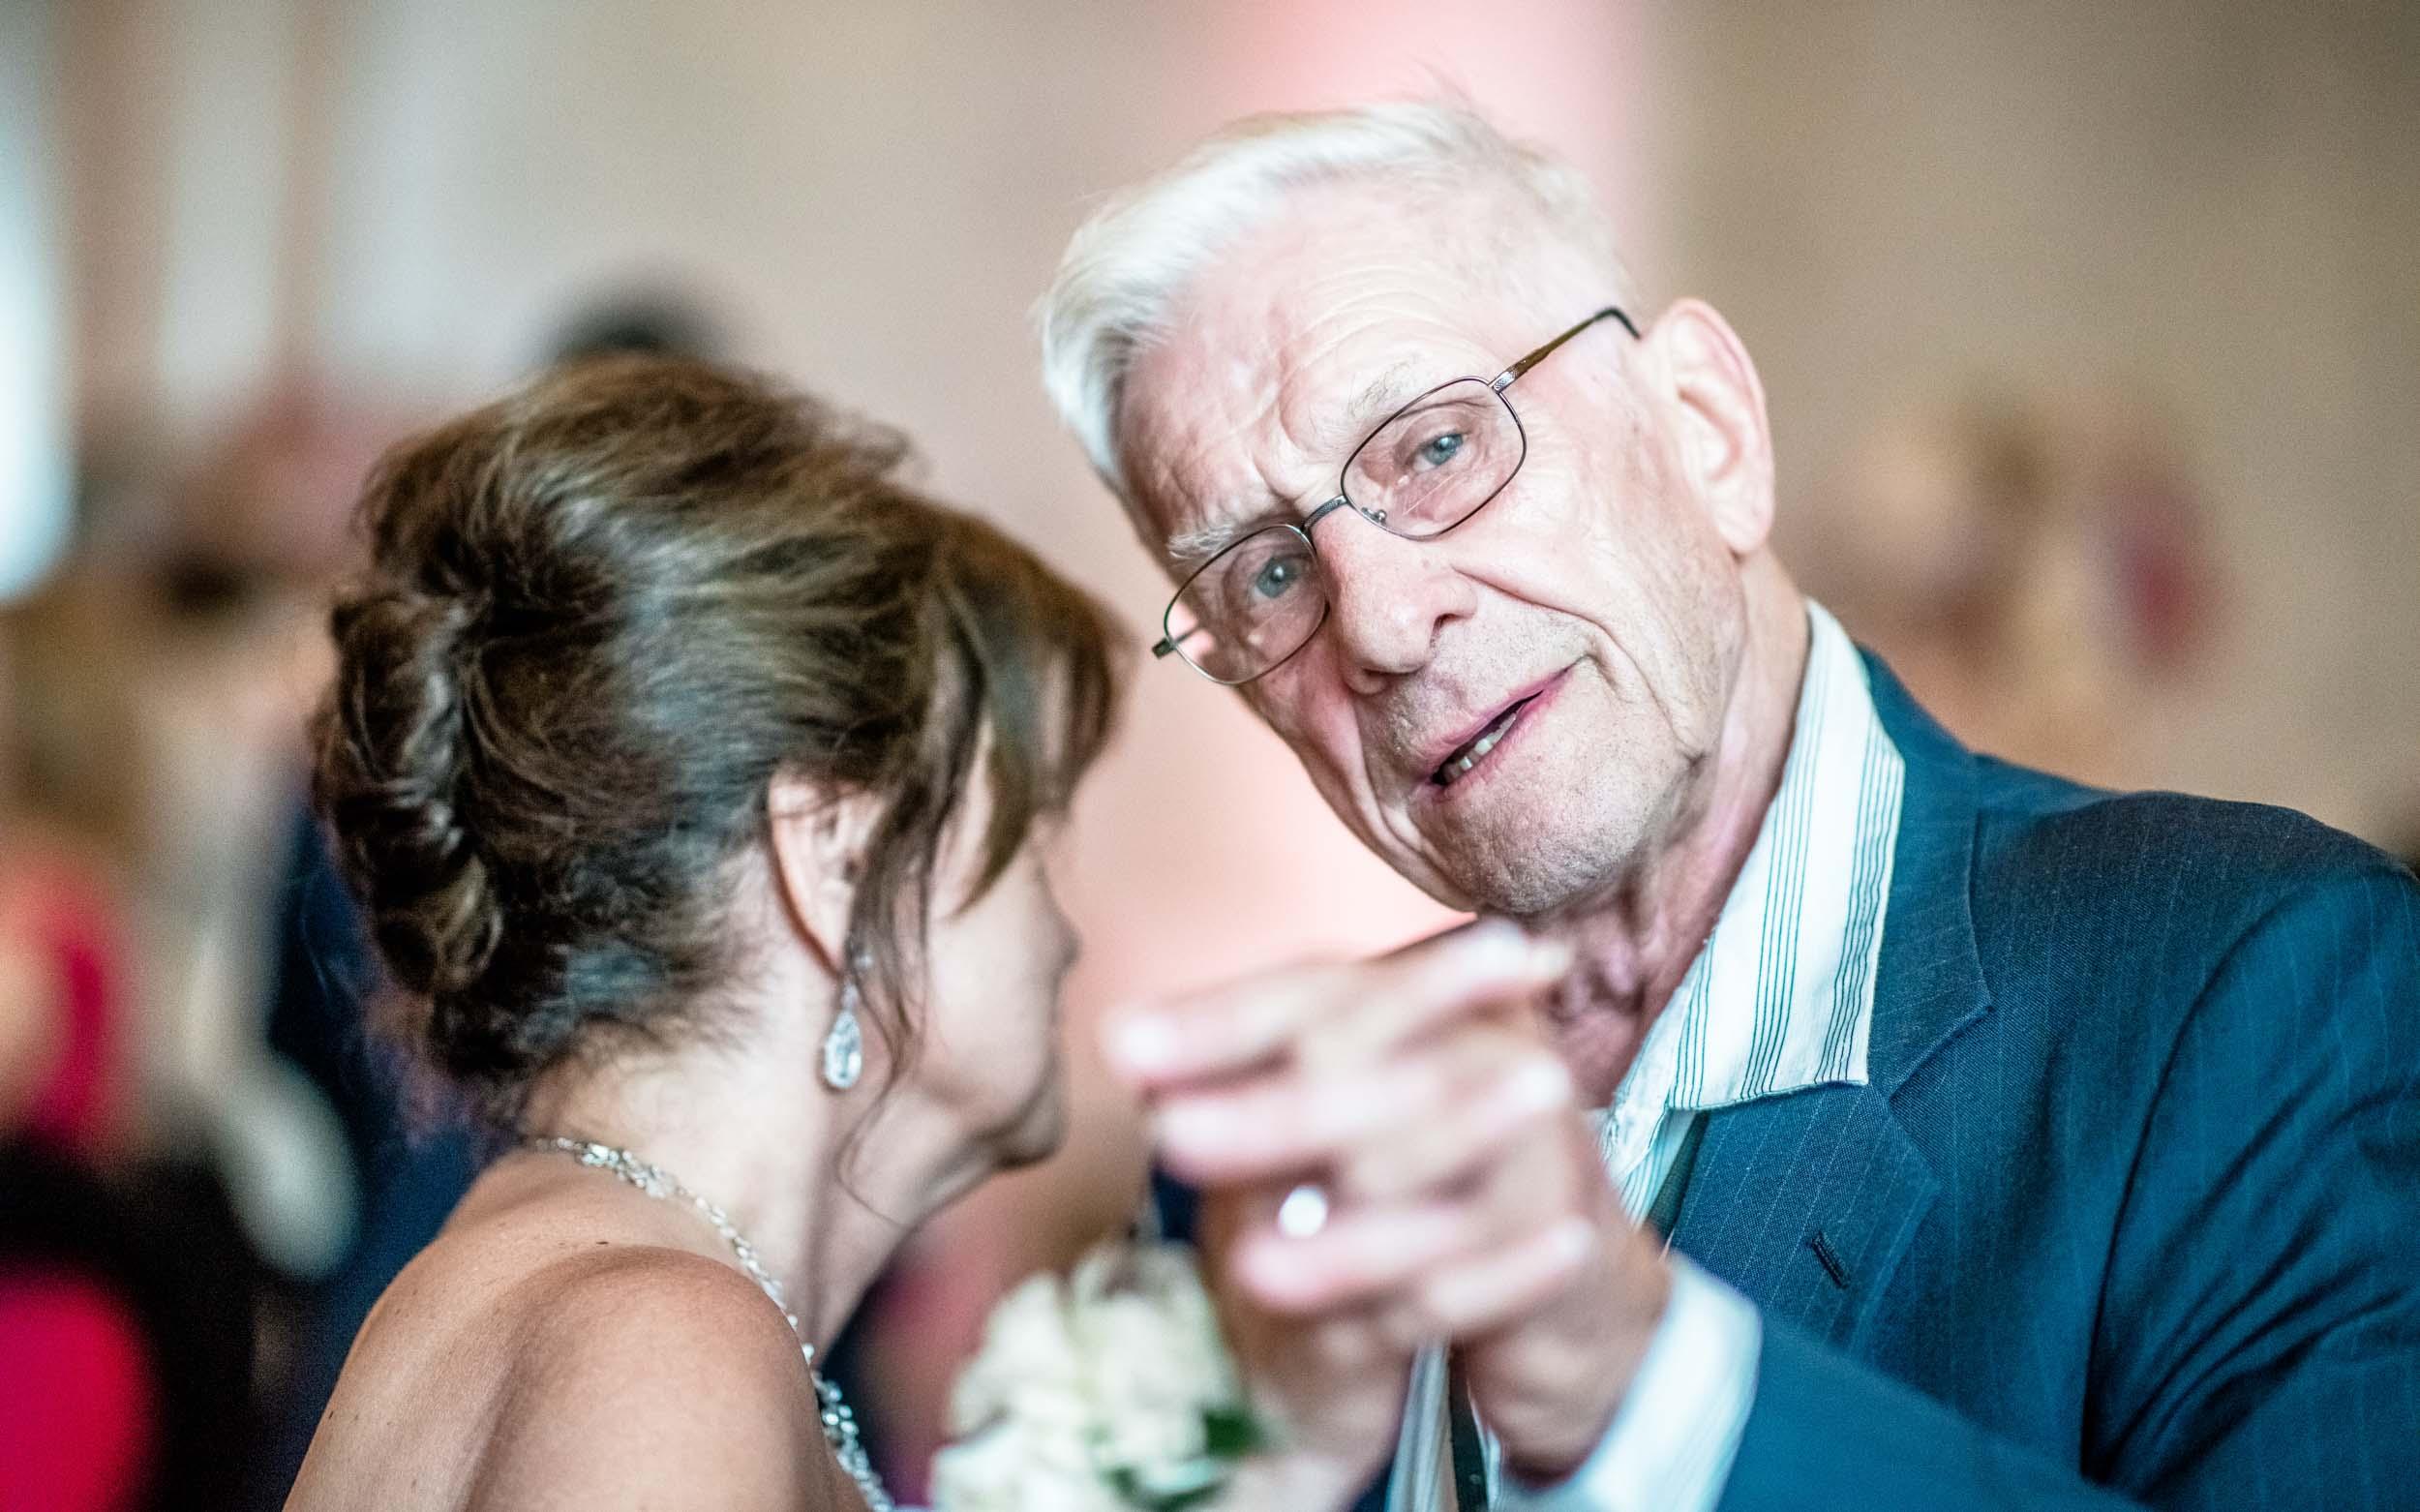 dc+metro+wedding+photographer+vadym+guliuk+photography+wedding+reception-2021.jpg